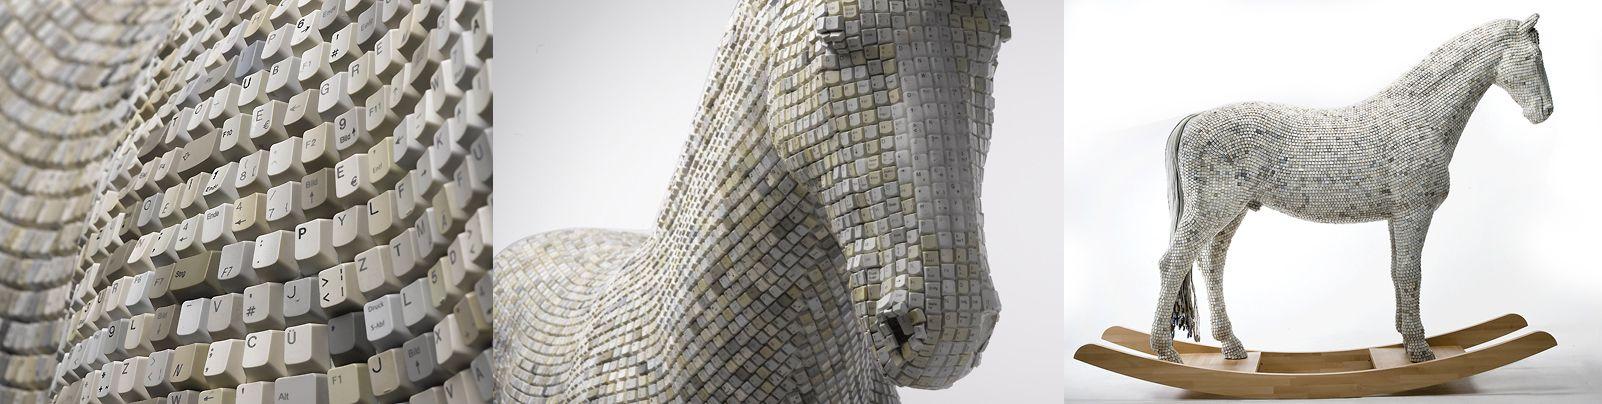 The digital horse by babiscloud.de